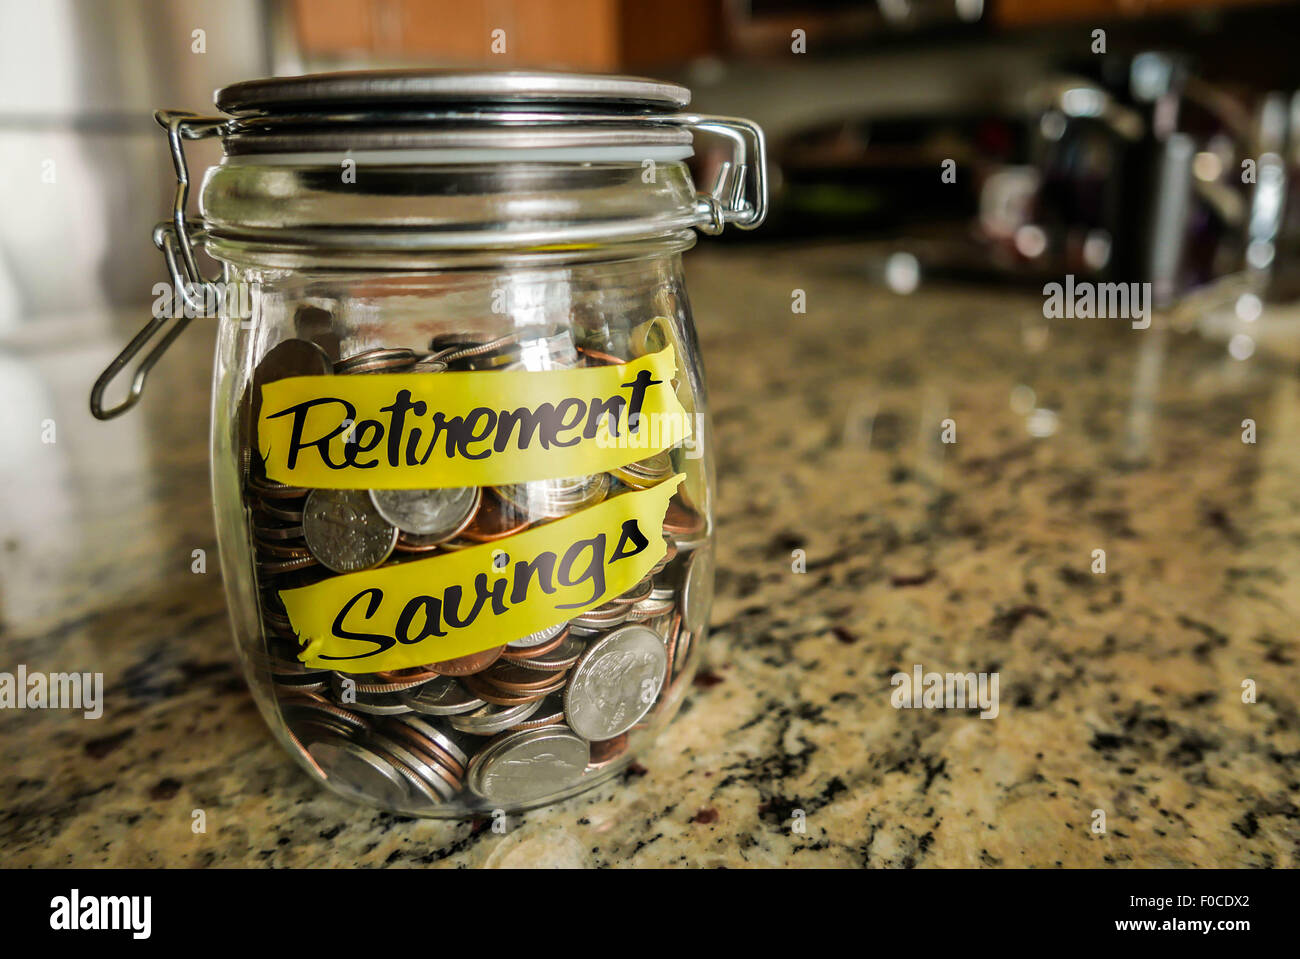 Retirement Savings Money Jar - Stock Image